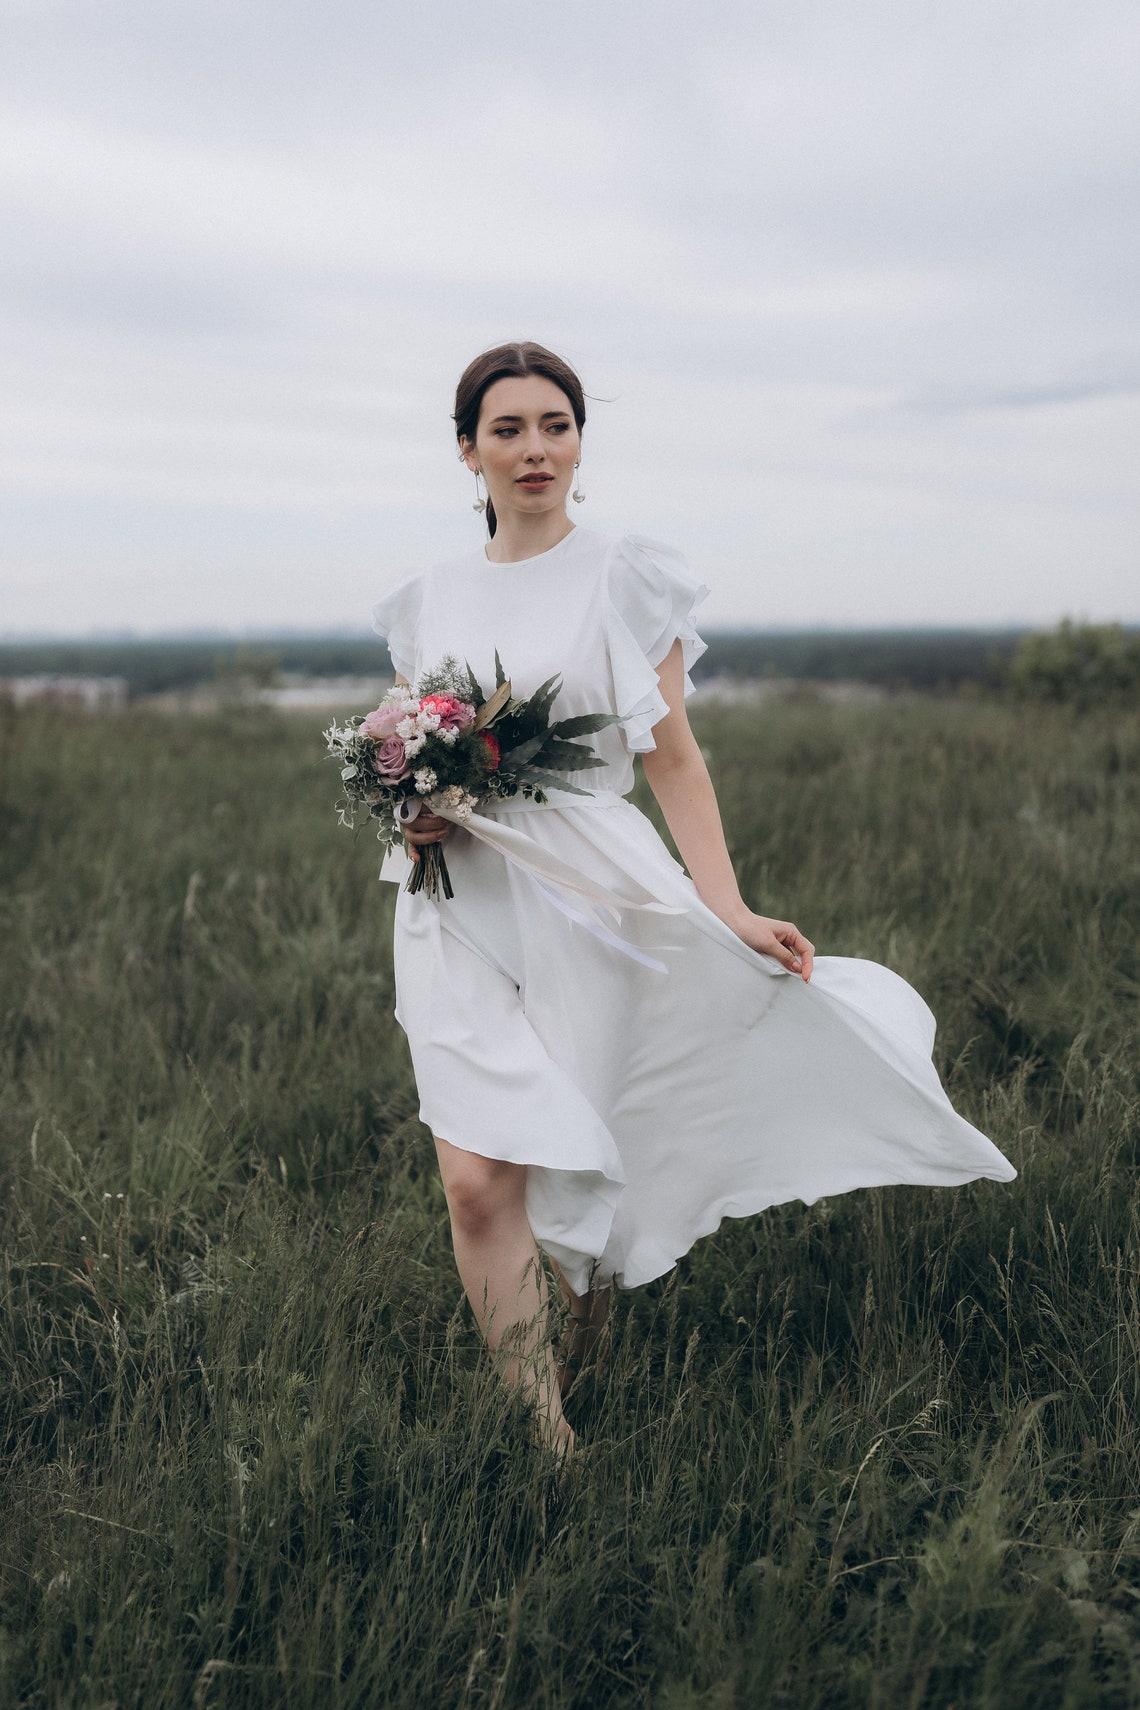 Simple wedding dress, white wedding dress, wedding white dress, midi white dress, midi wedding dress, summer wedding dress, summer dress